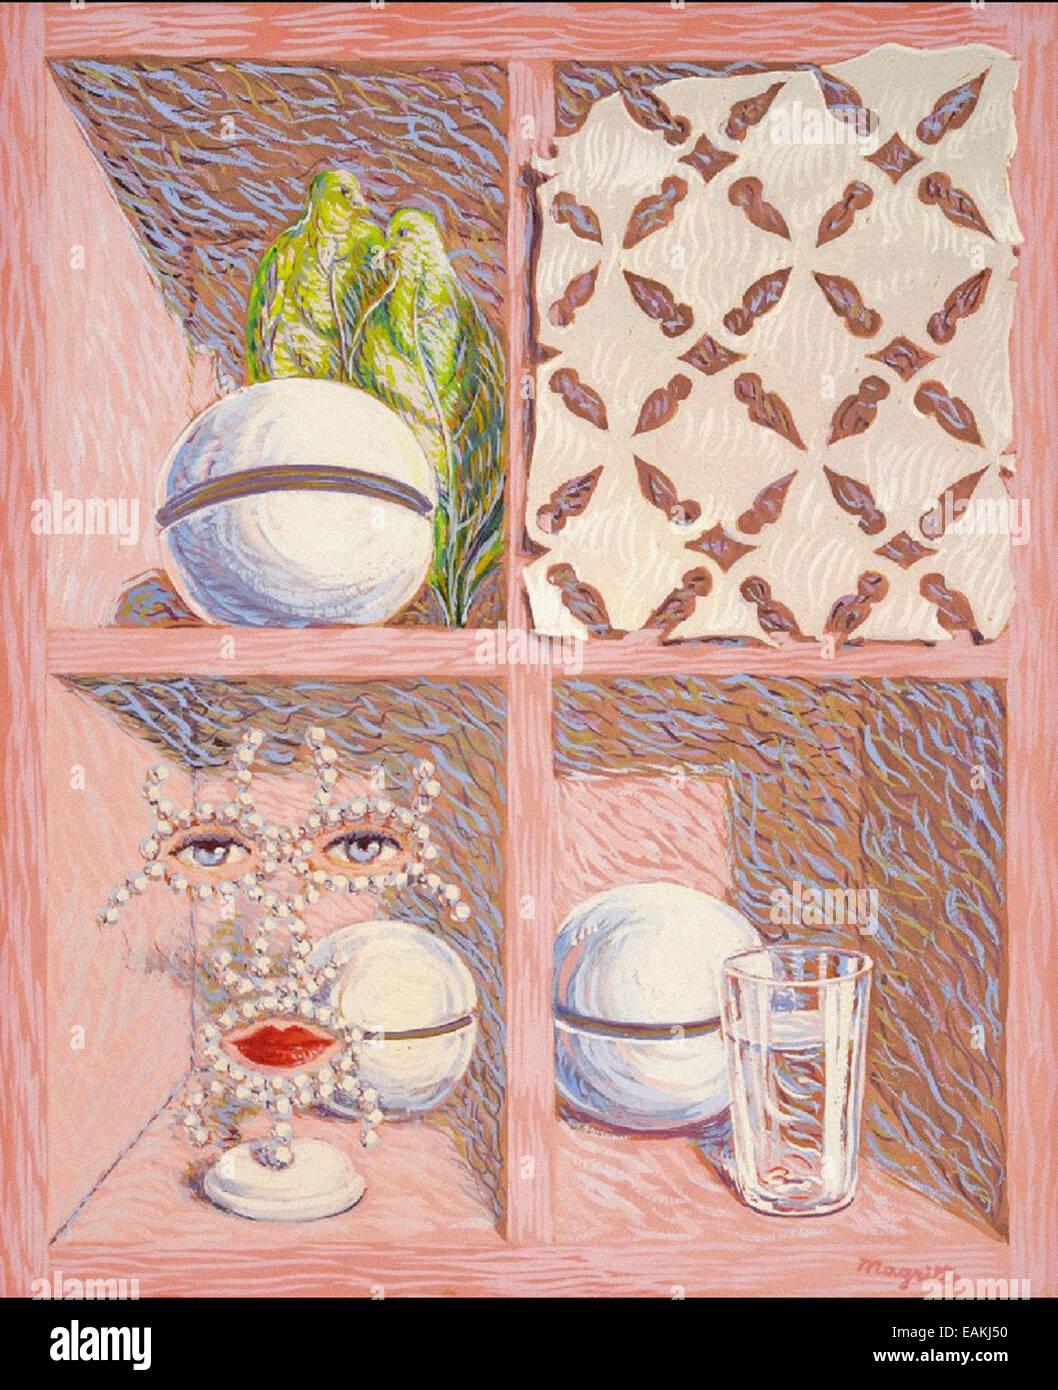 René Magritte Un Siècle de Geduld Stockbild